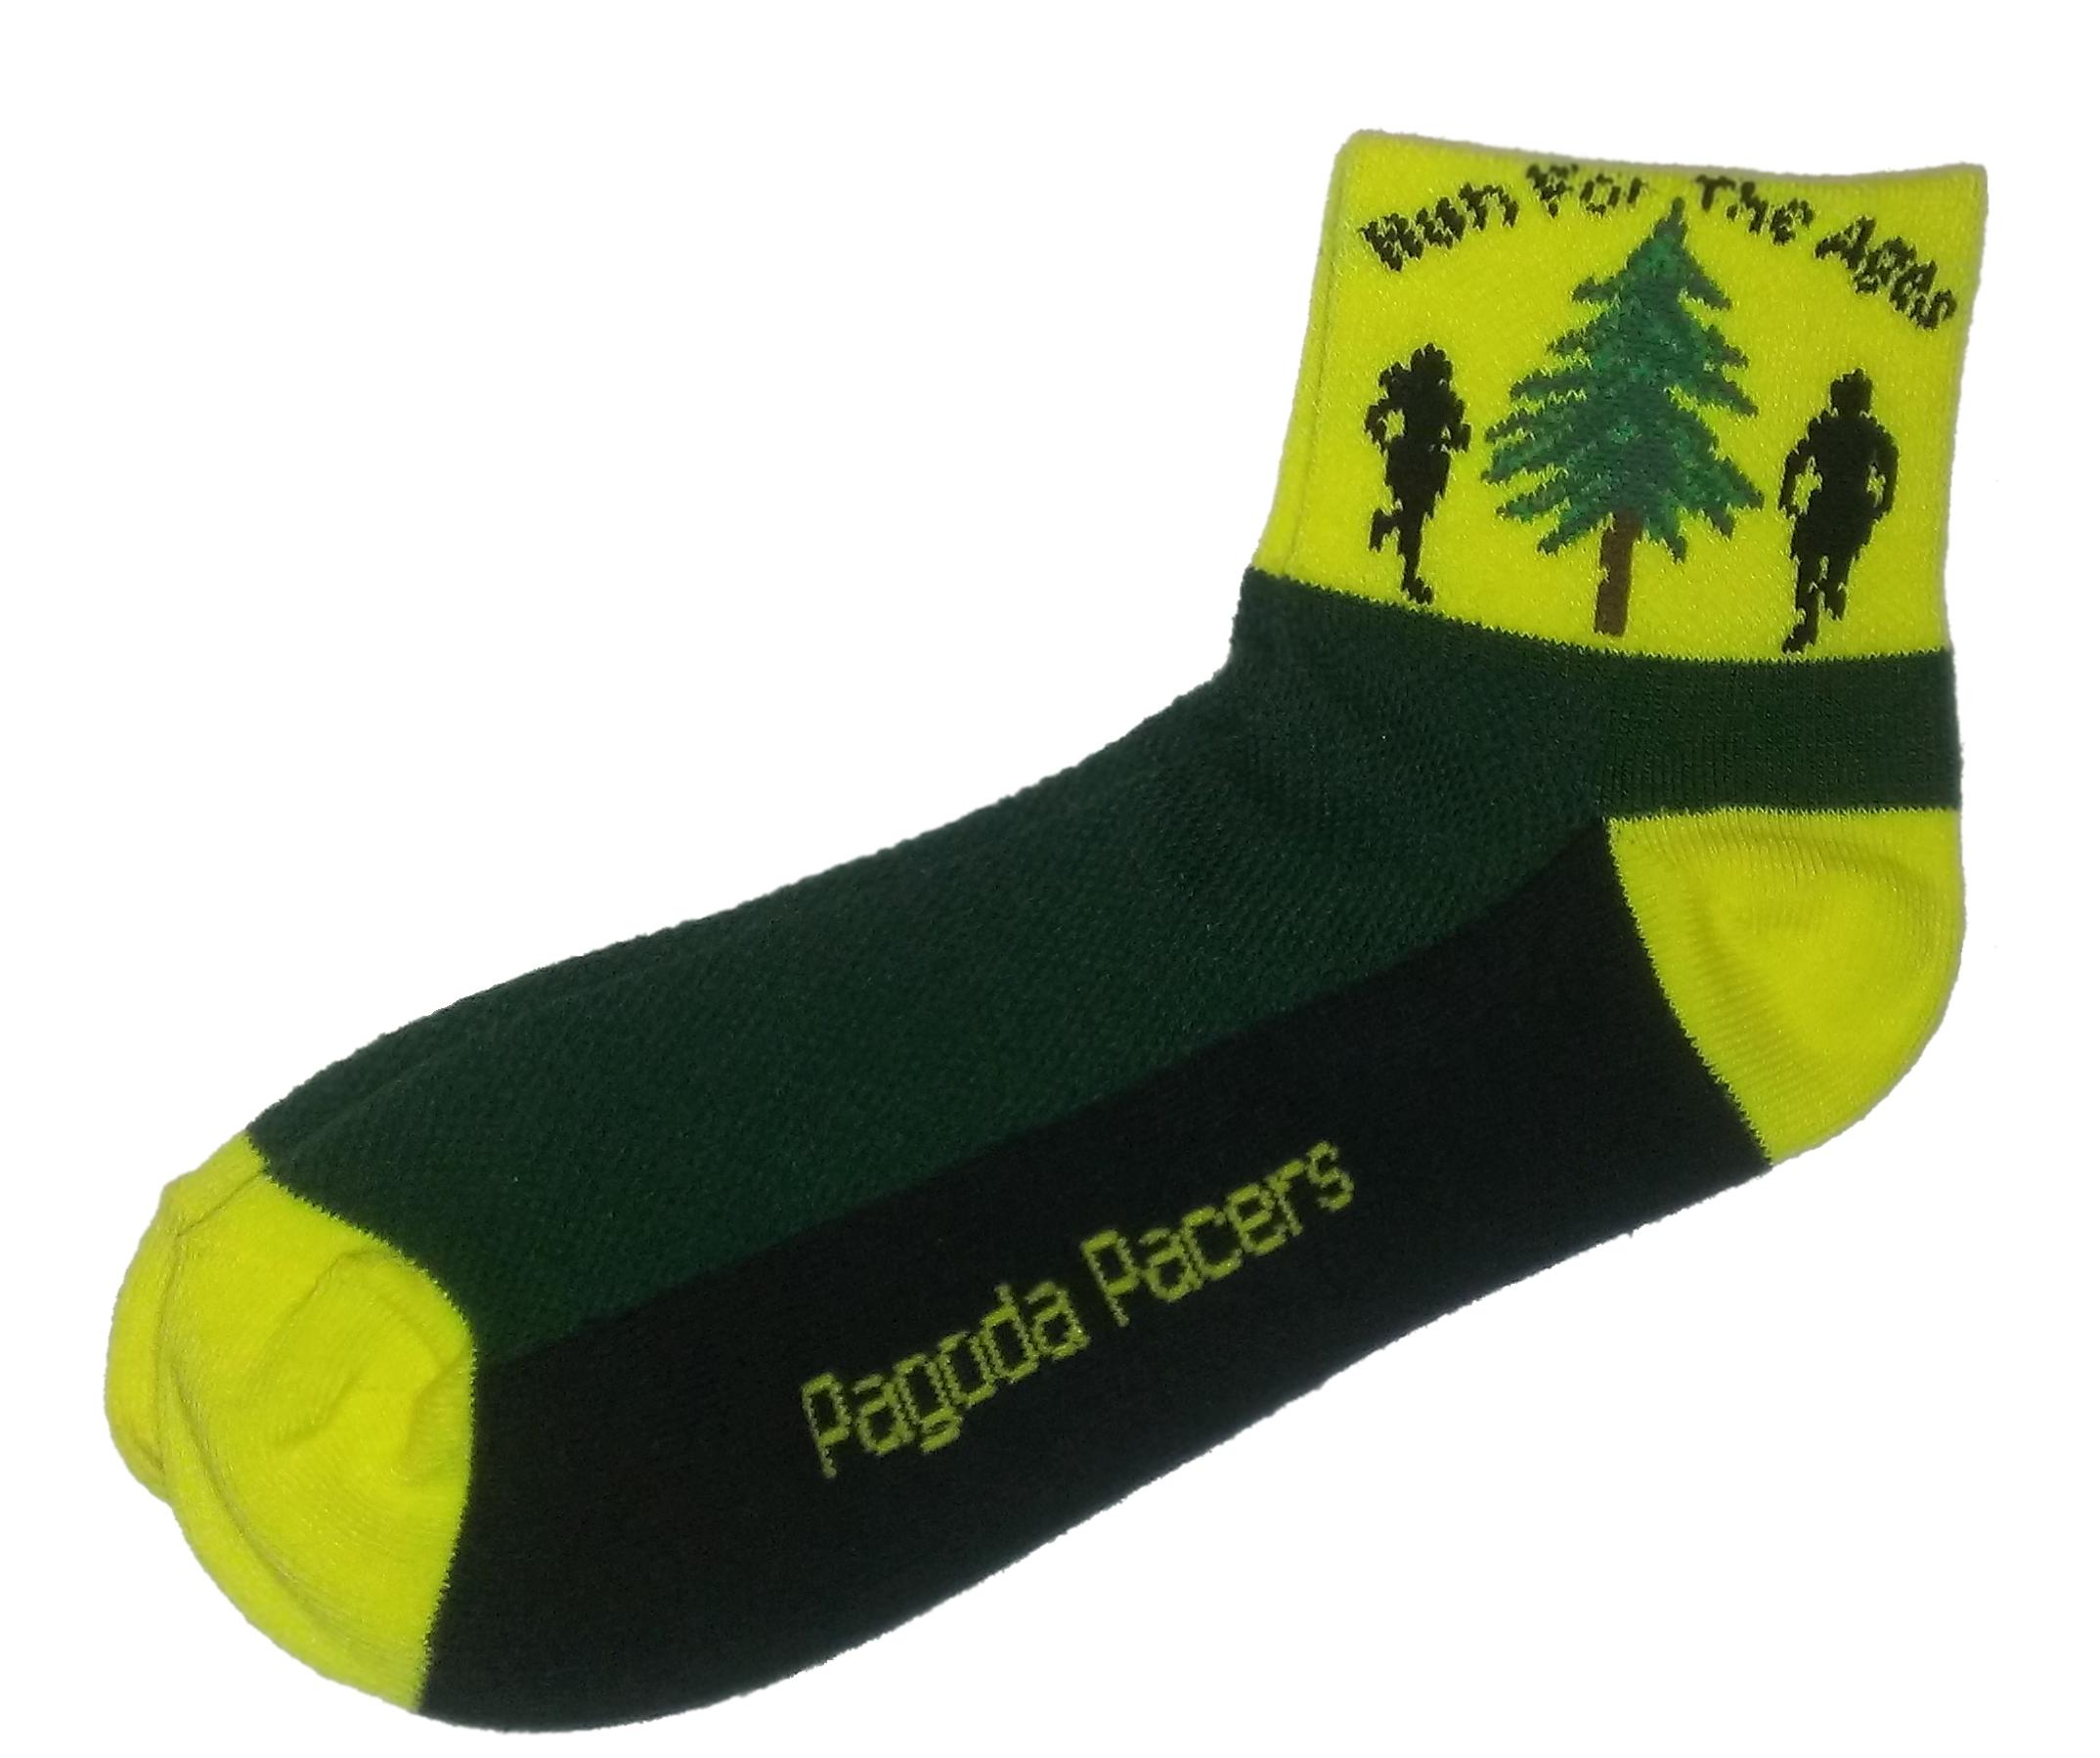 Custom-Socks-NLZ-Pagoda-Pacers.jpg